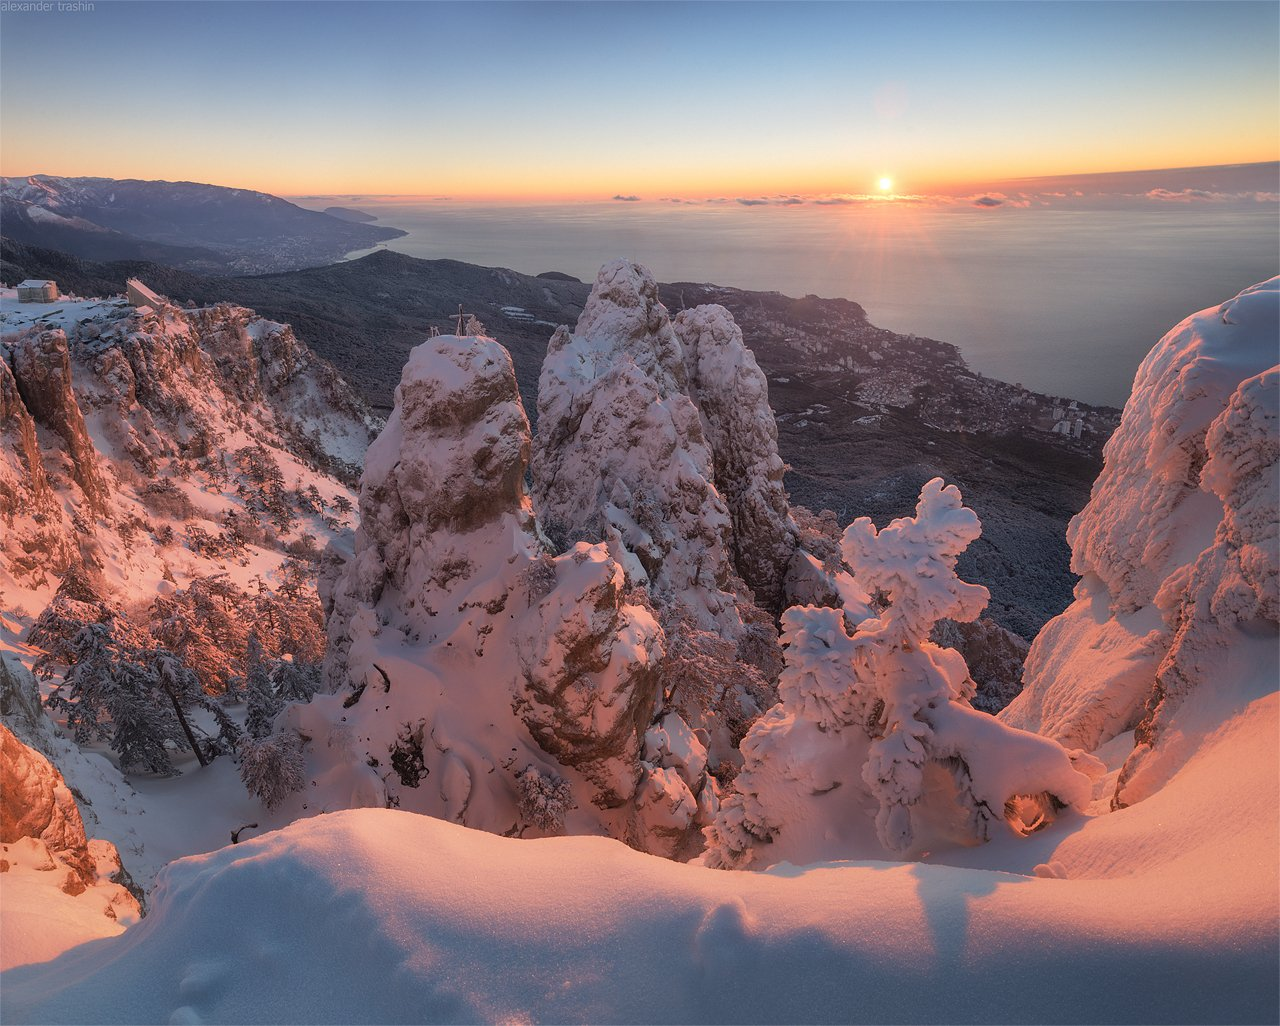 крым, ай-петри, восход, пейзаж, Александр Трашин